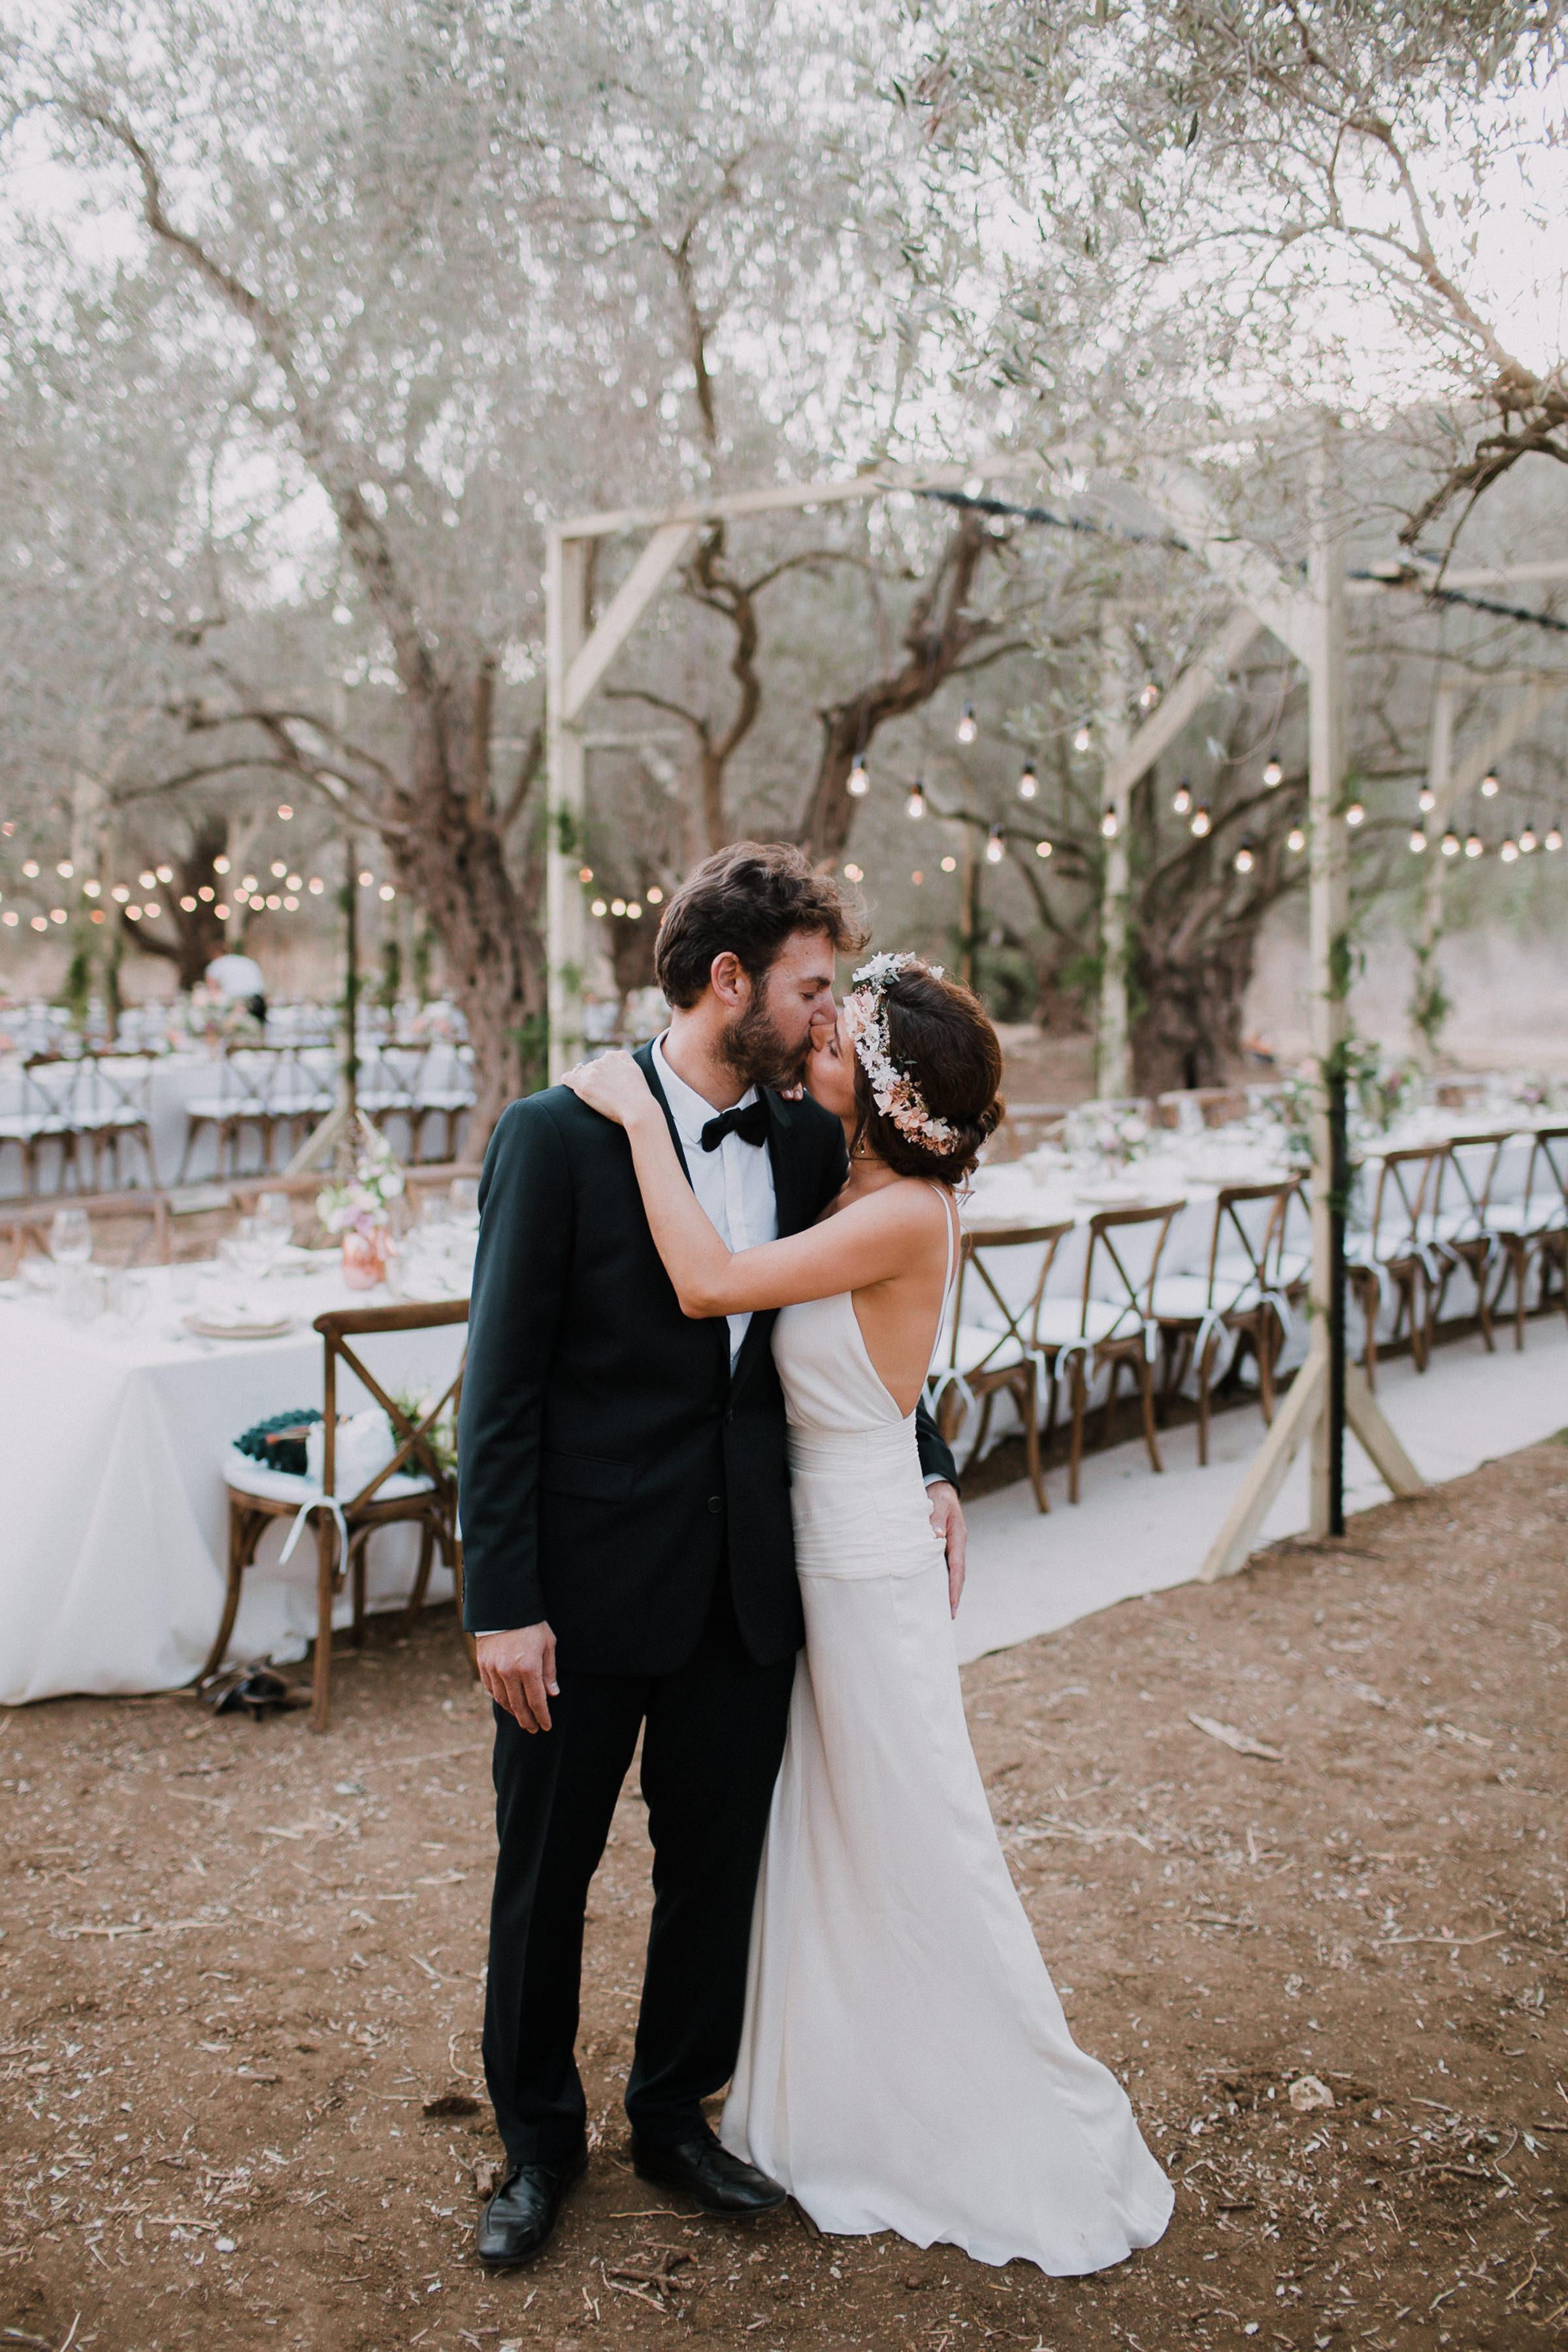 Made in Israel: הרגעים שמרכיבים חתונות בישראל